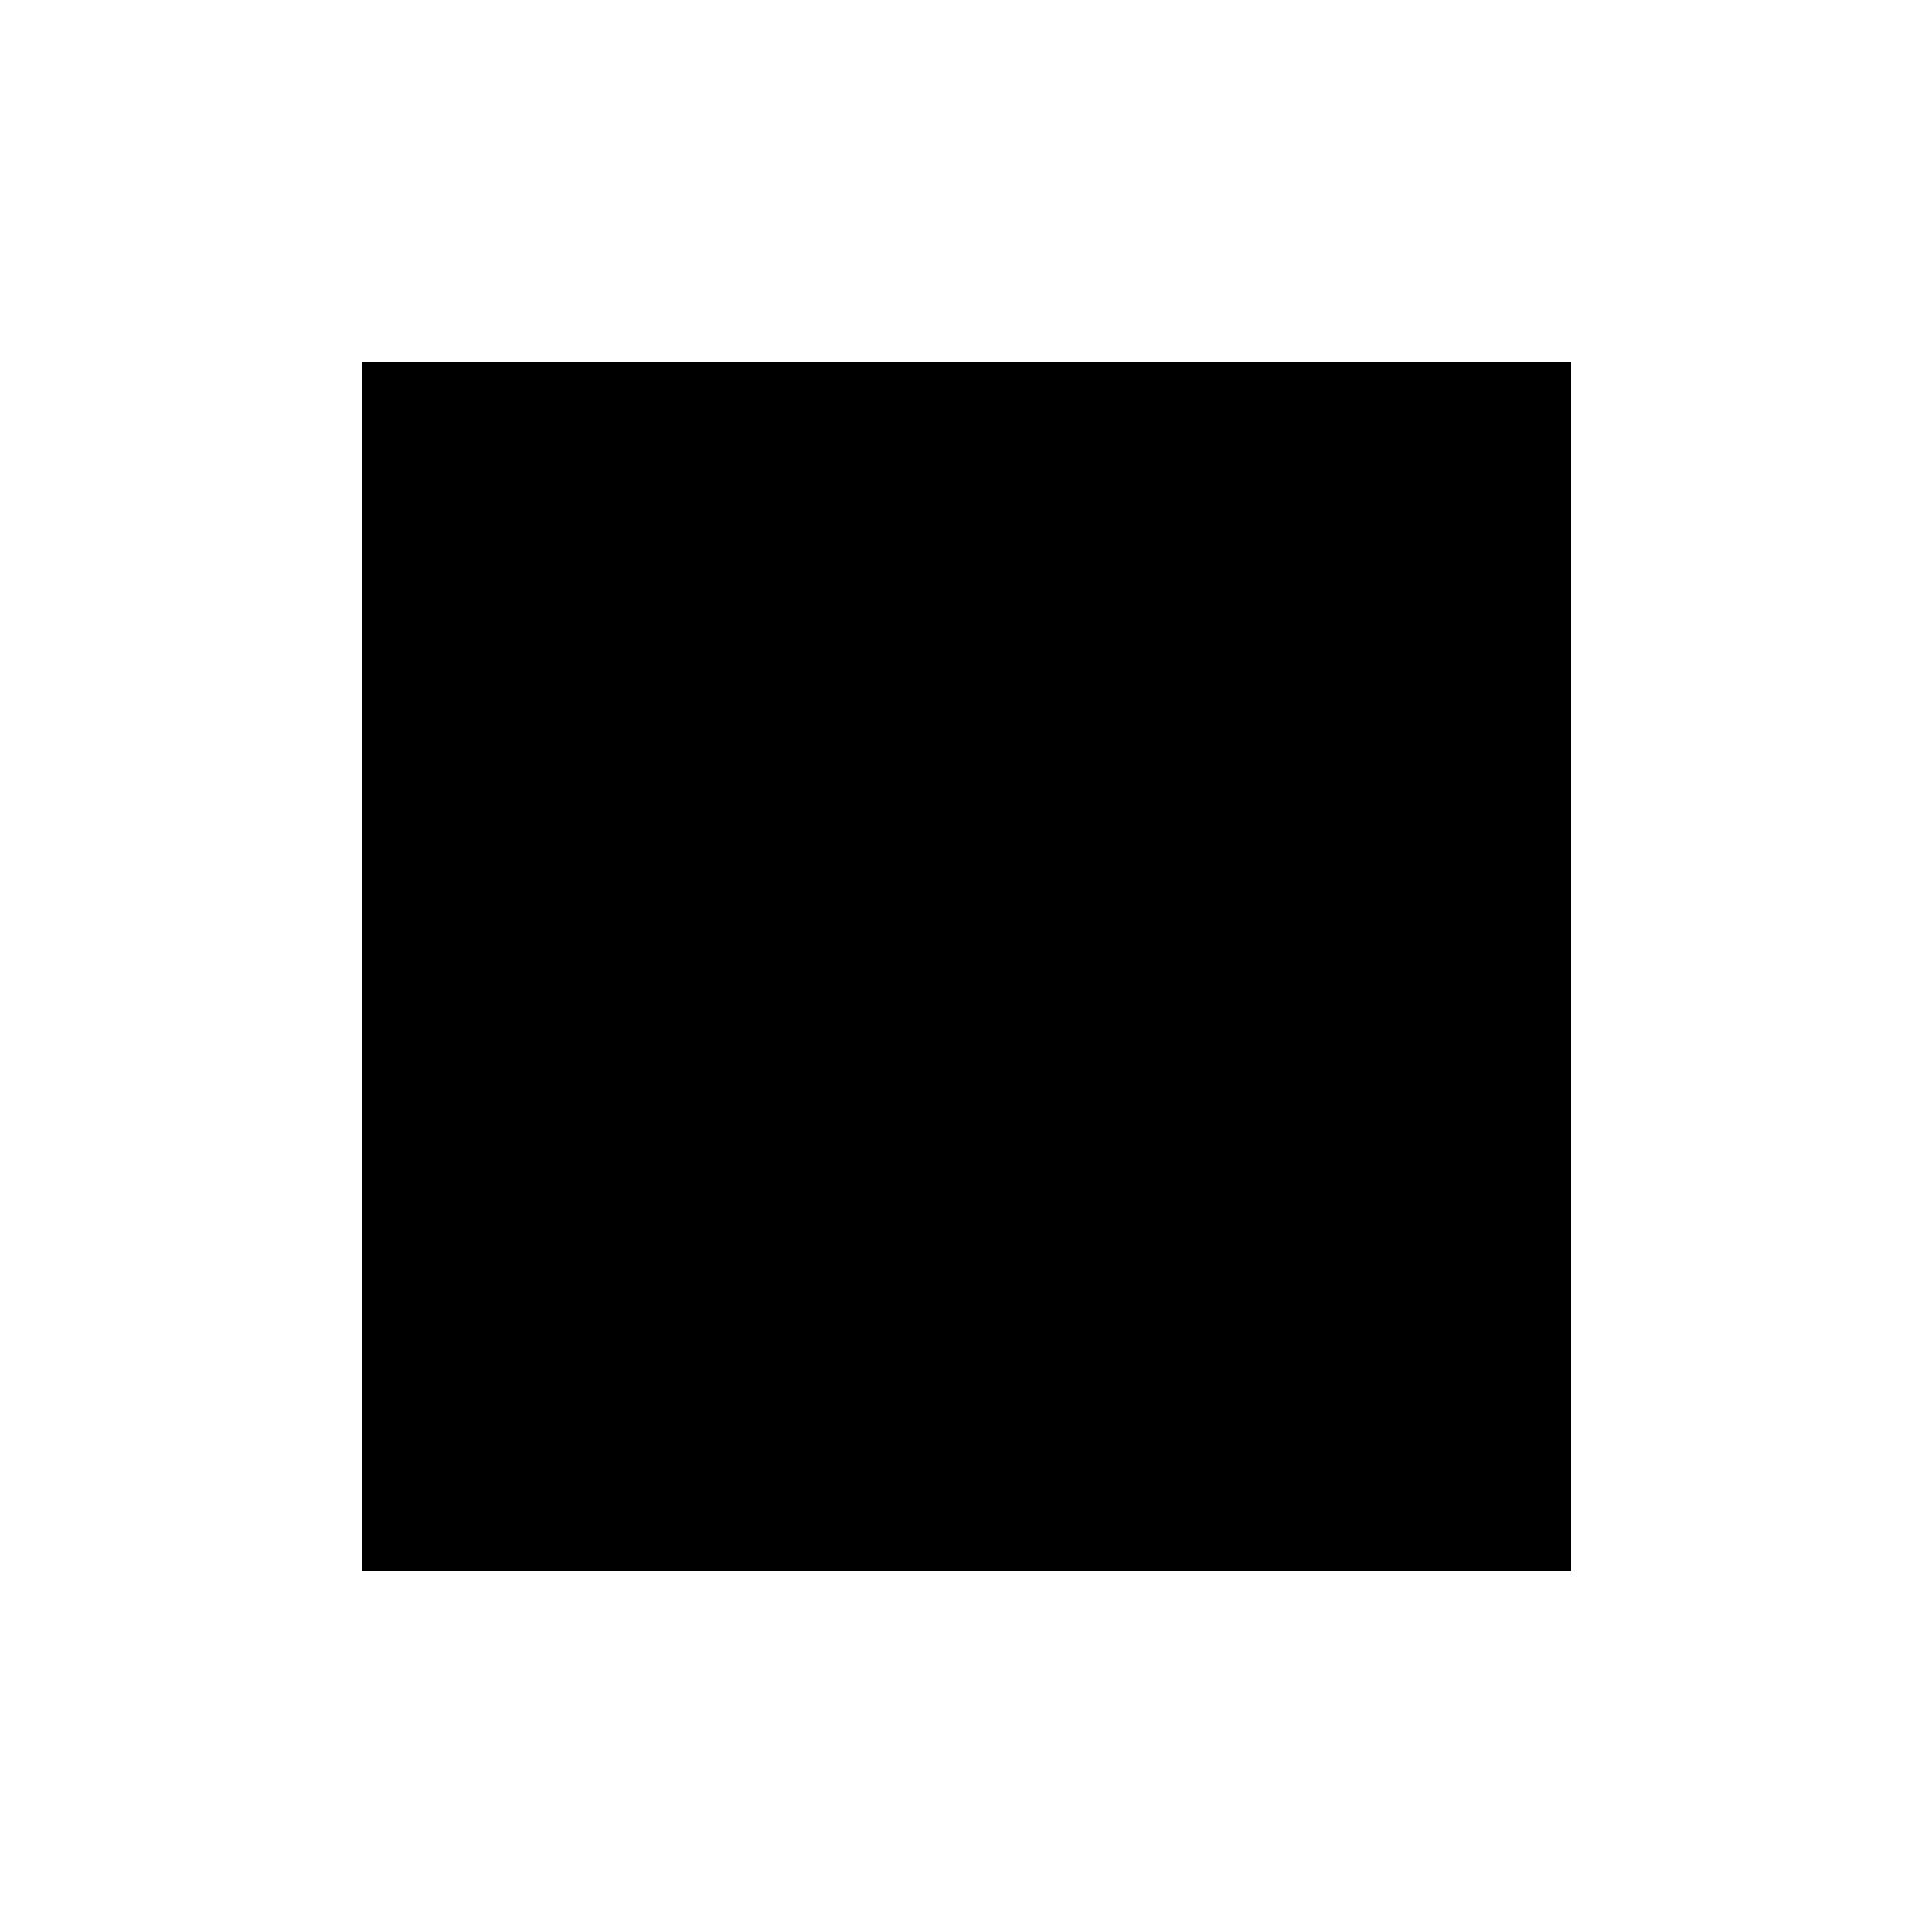 facebook-black-icon.png